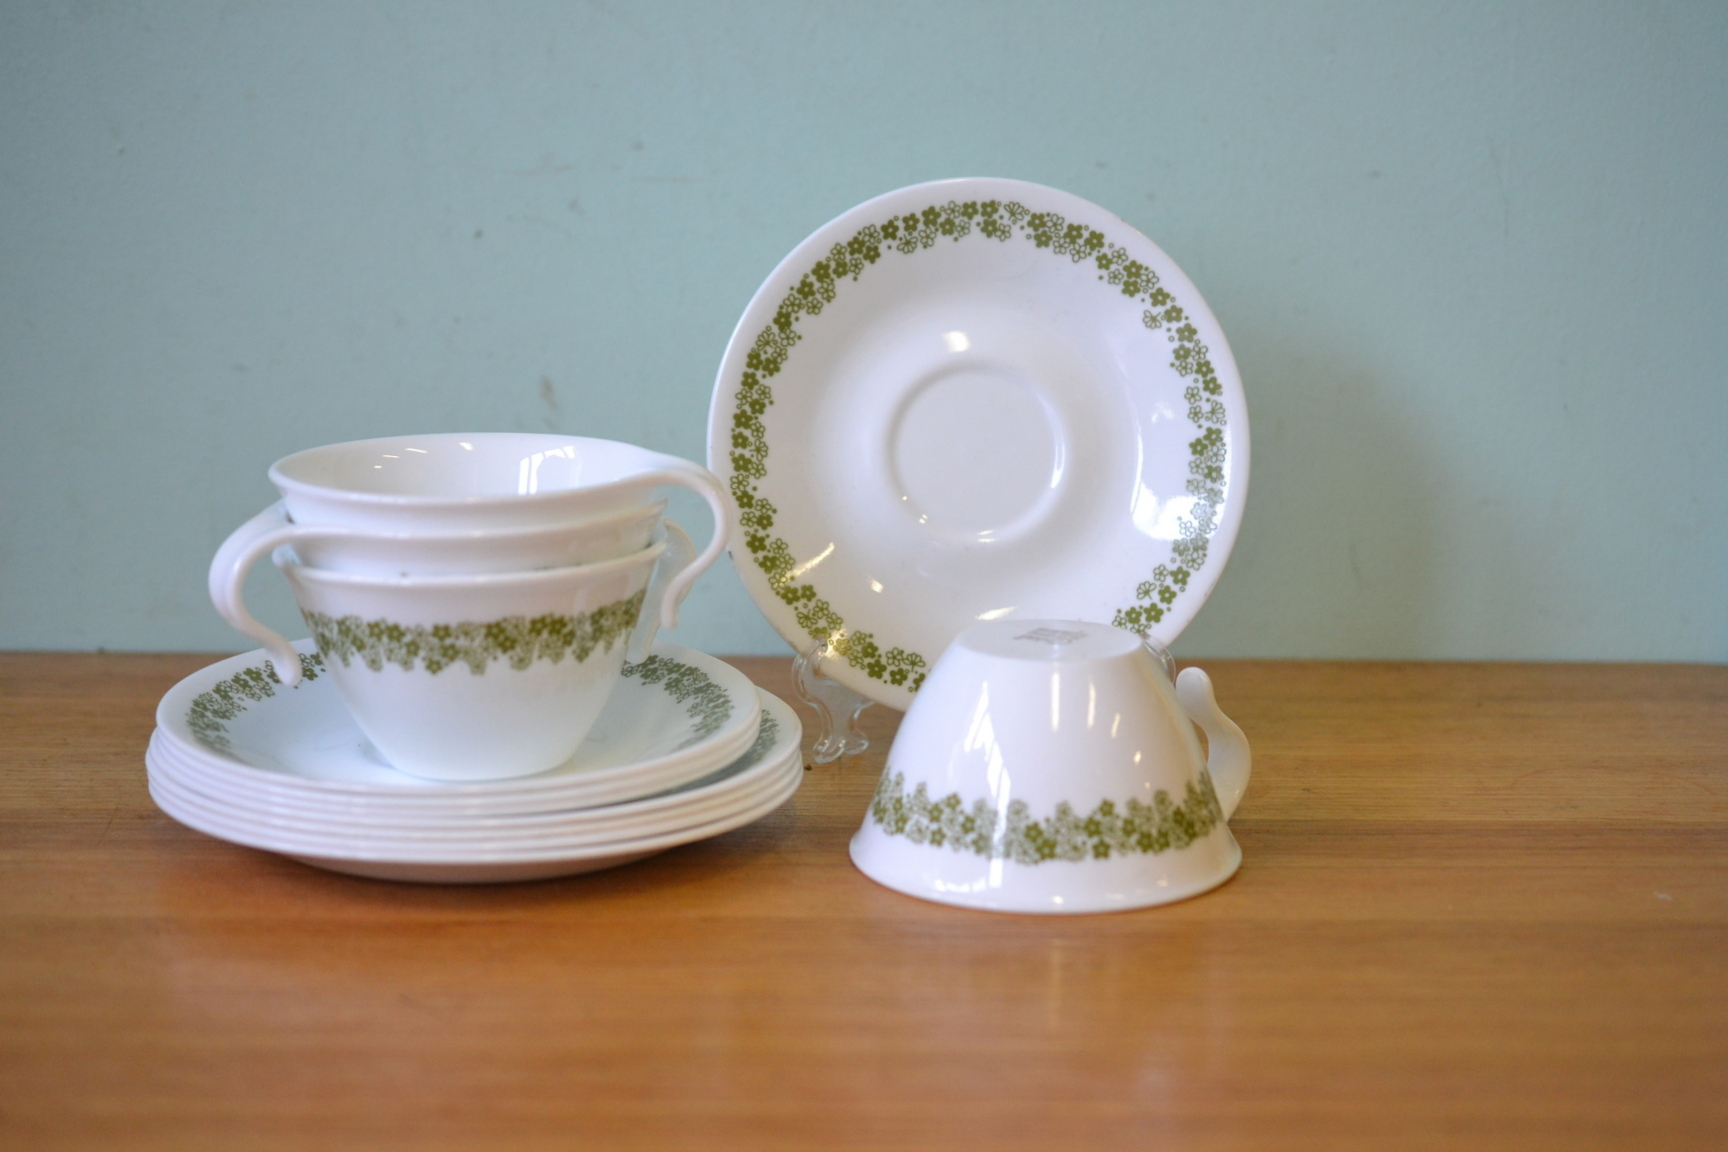 Vintage Corelle Trio Tea Cups And Saucers Glassware X4